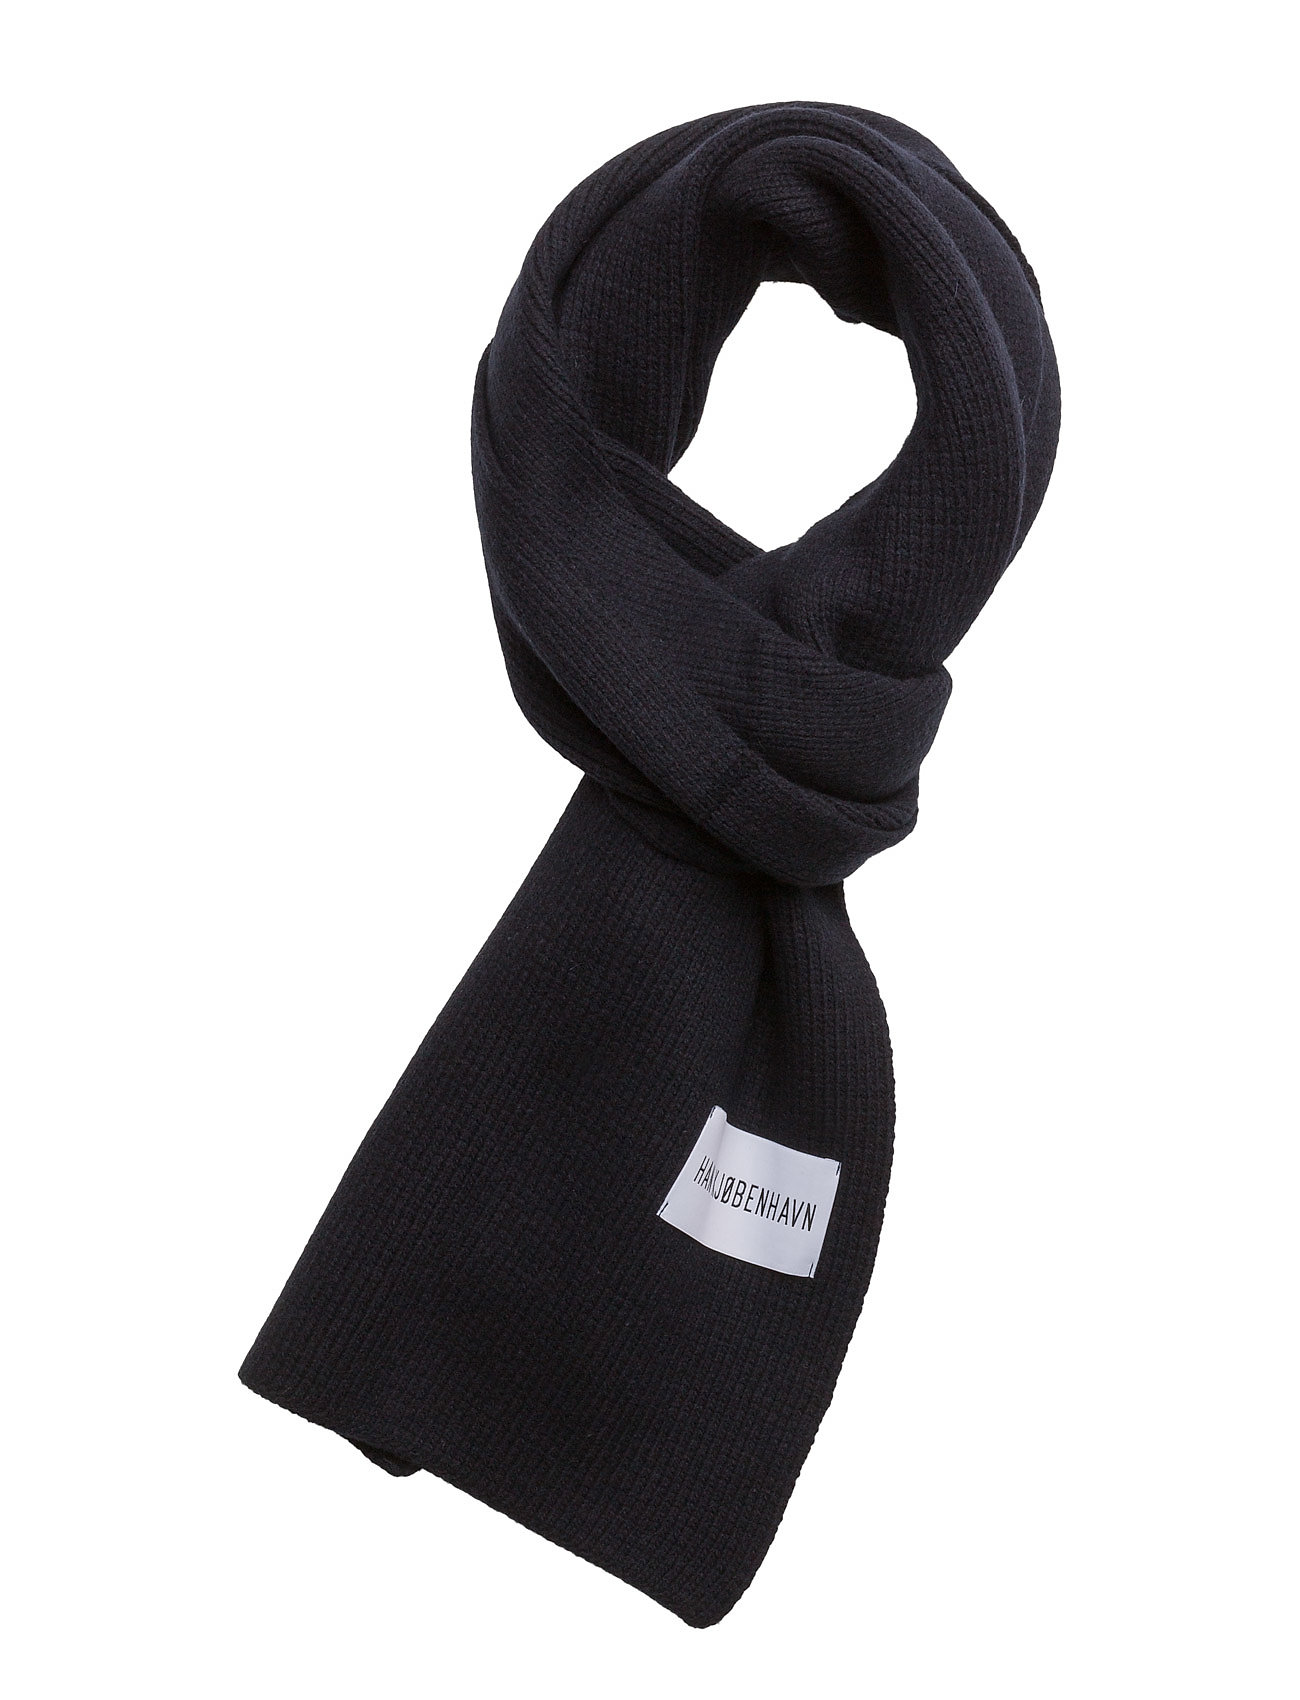 han kjã¸benhavn – Heavy scarf fra boozt.com dk